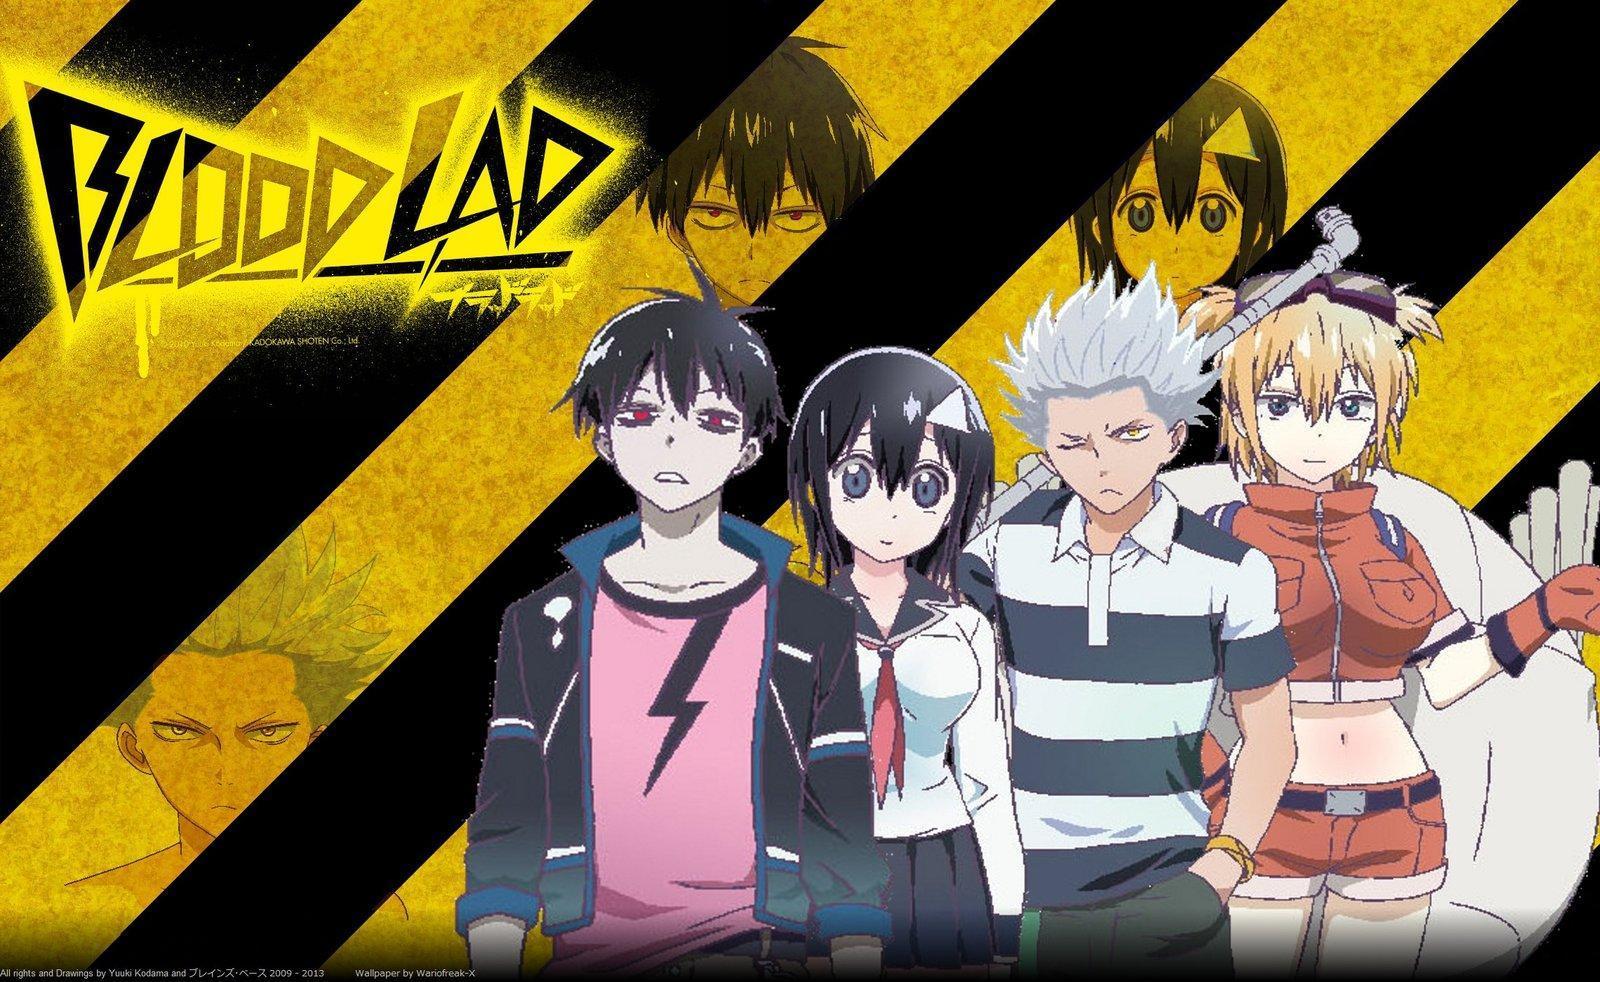 comedy and fantasy anime like jahy sama anime, Blood Lad